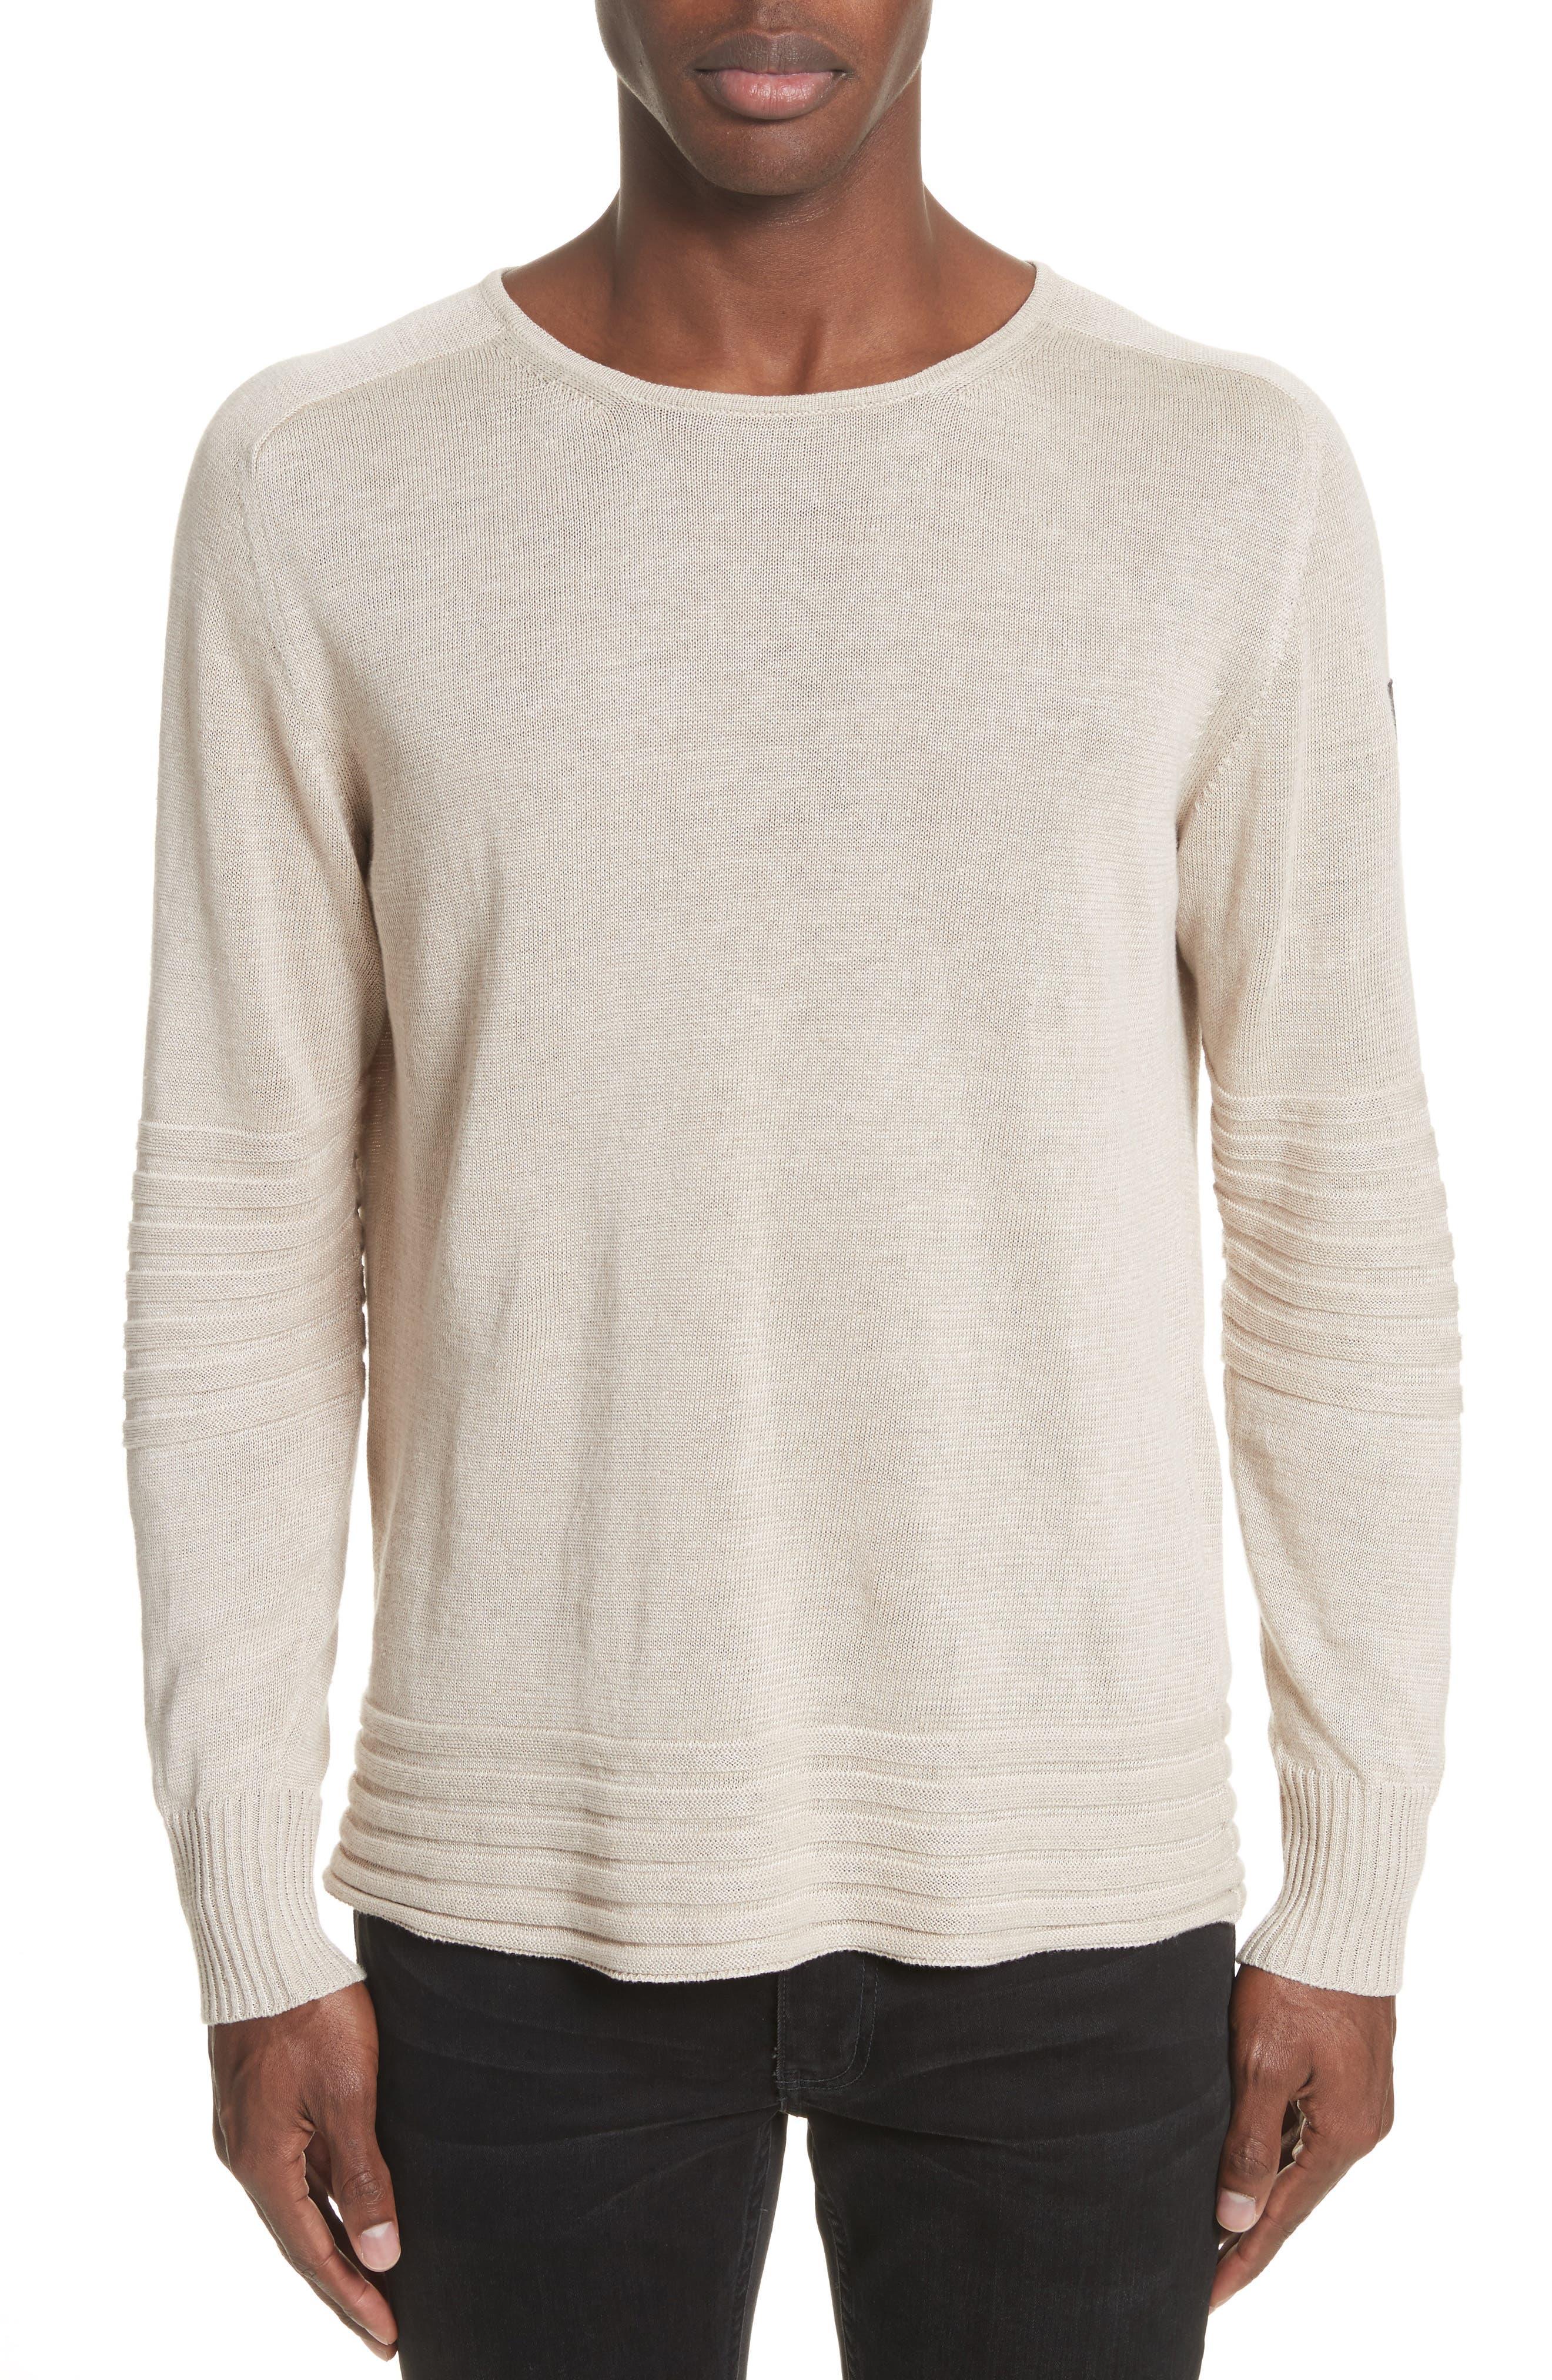 Exford Linen Crewneck Sweater,                         Main,                         color, Light Sand